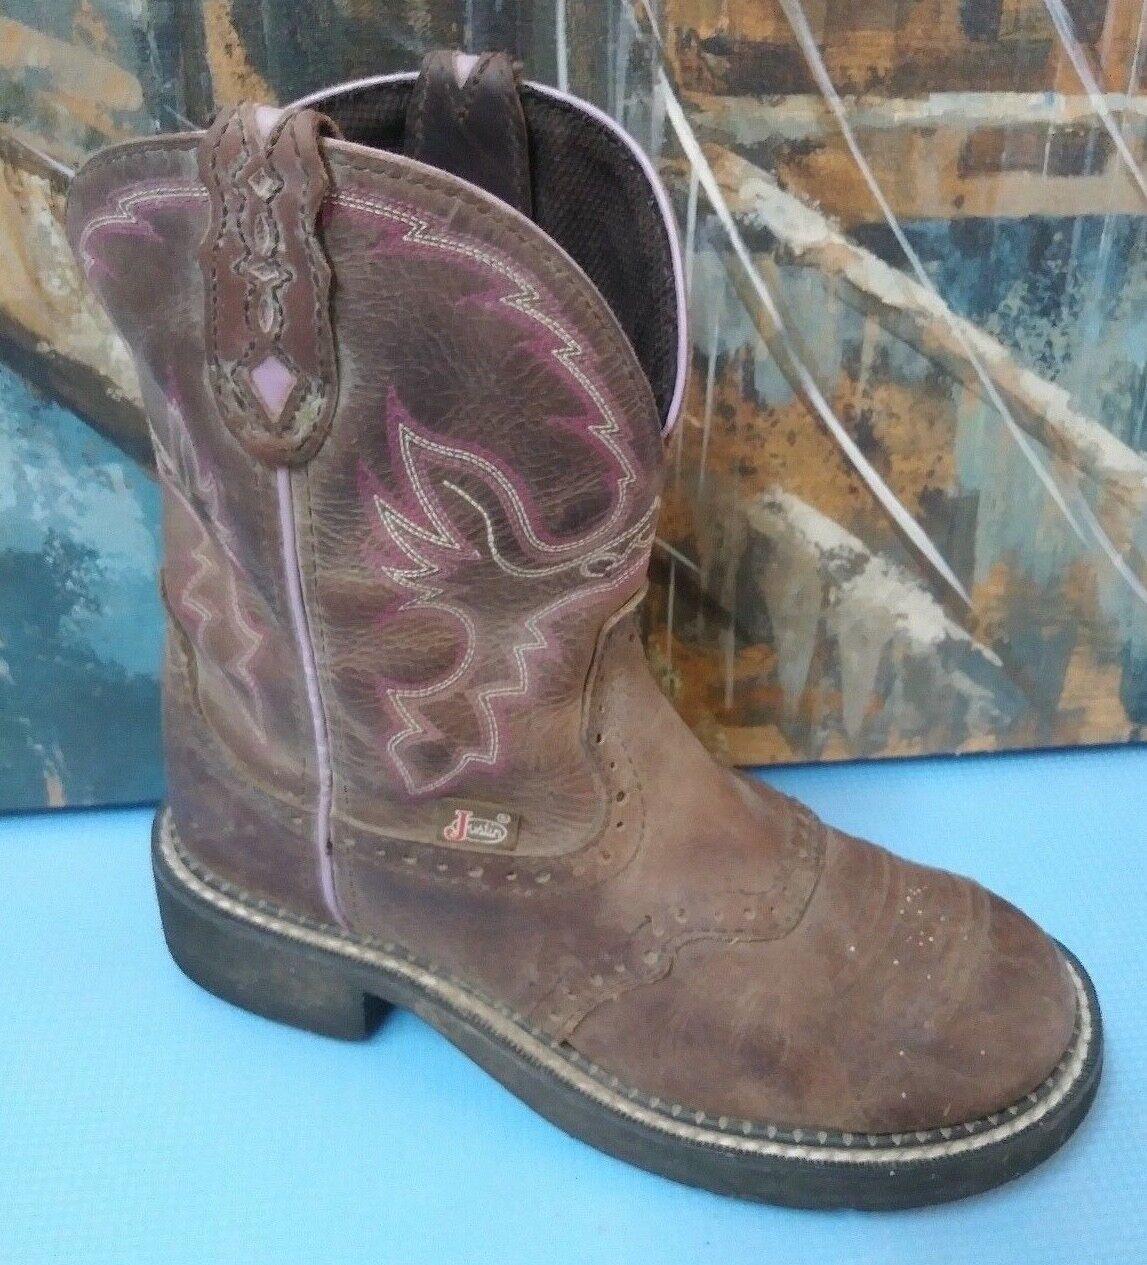 JUSTIN GYPSY 6.5 B L9903 Brown Purple T ROPER WESTERN COWBOY BOOTS